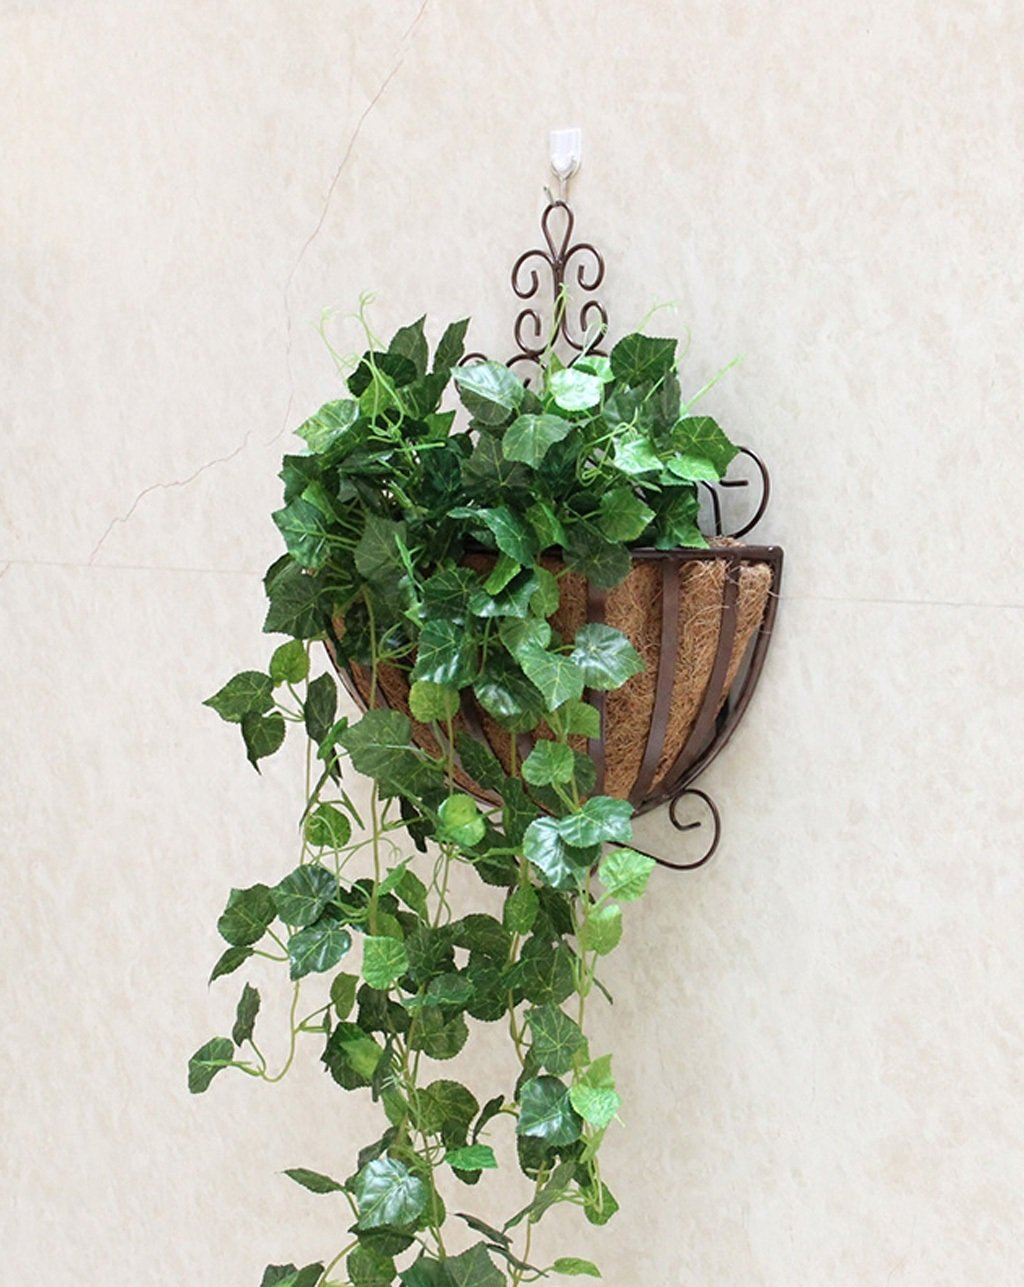 ZENGAI 植物スタンド2個、壁掛けフラワーポットラック吊り屋内バルコニーアイアンフラワーフレームは、盆栽フレームの壁に吊るす フラワースタンド ( 色 : B ) B07B6WHYFM B B